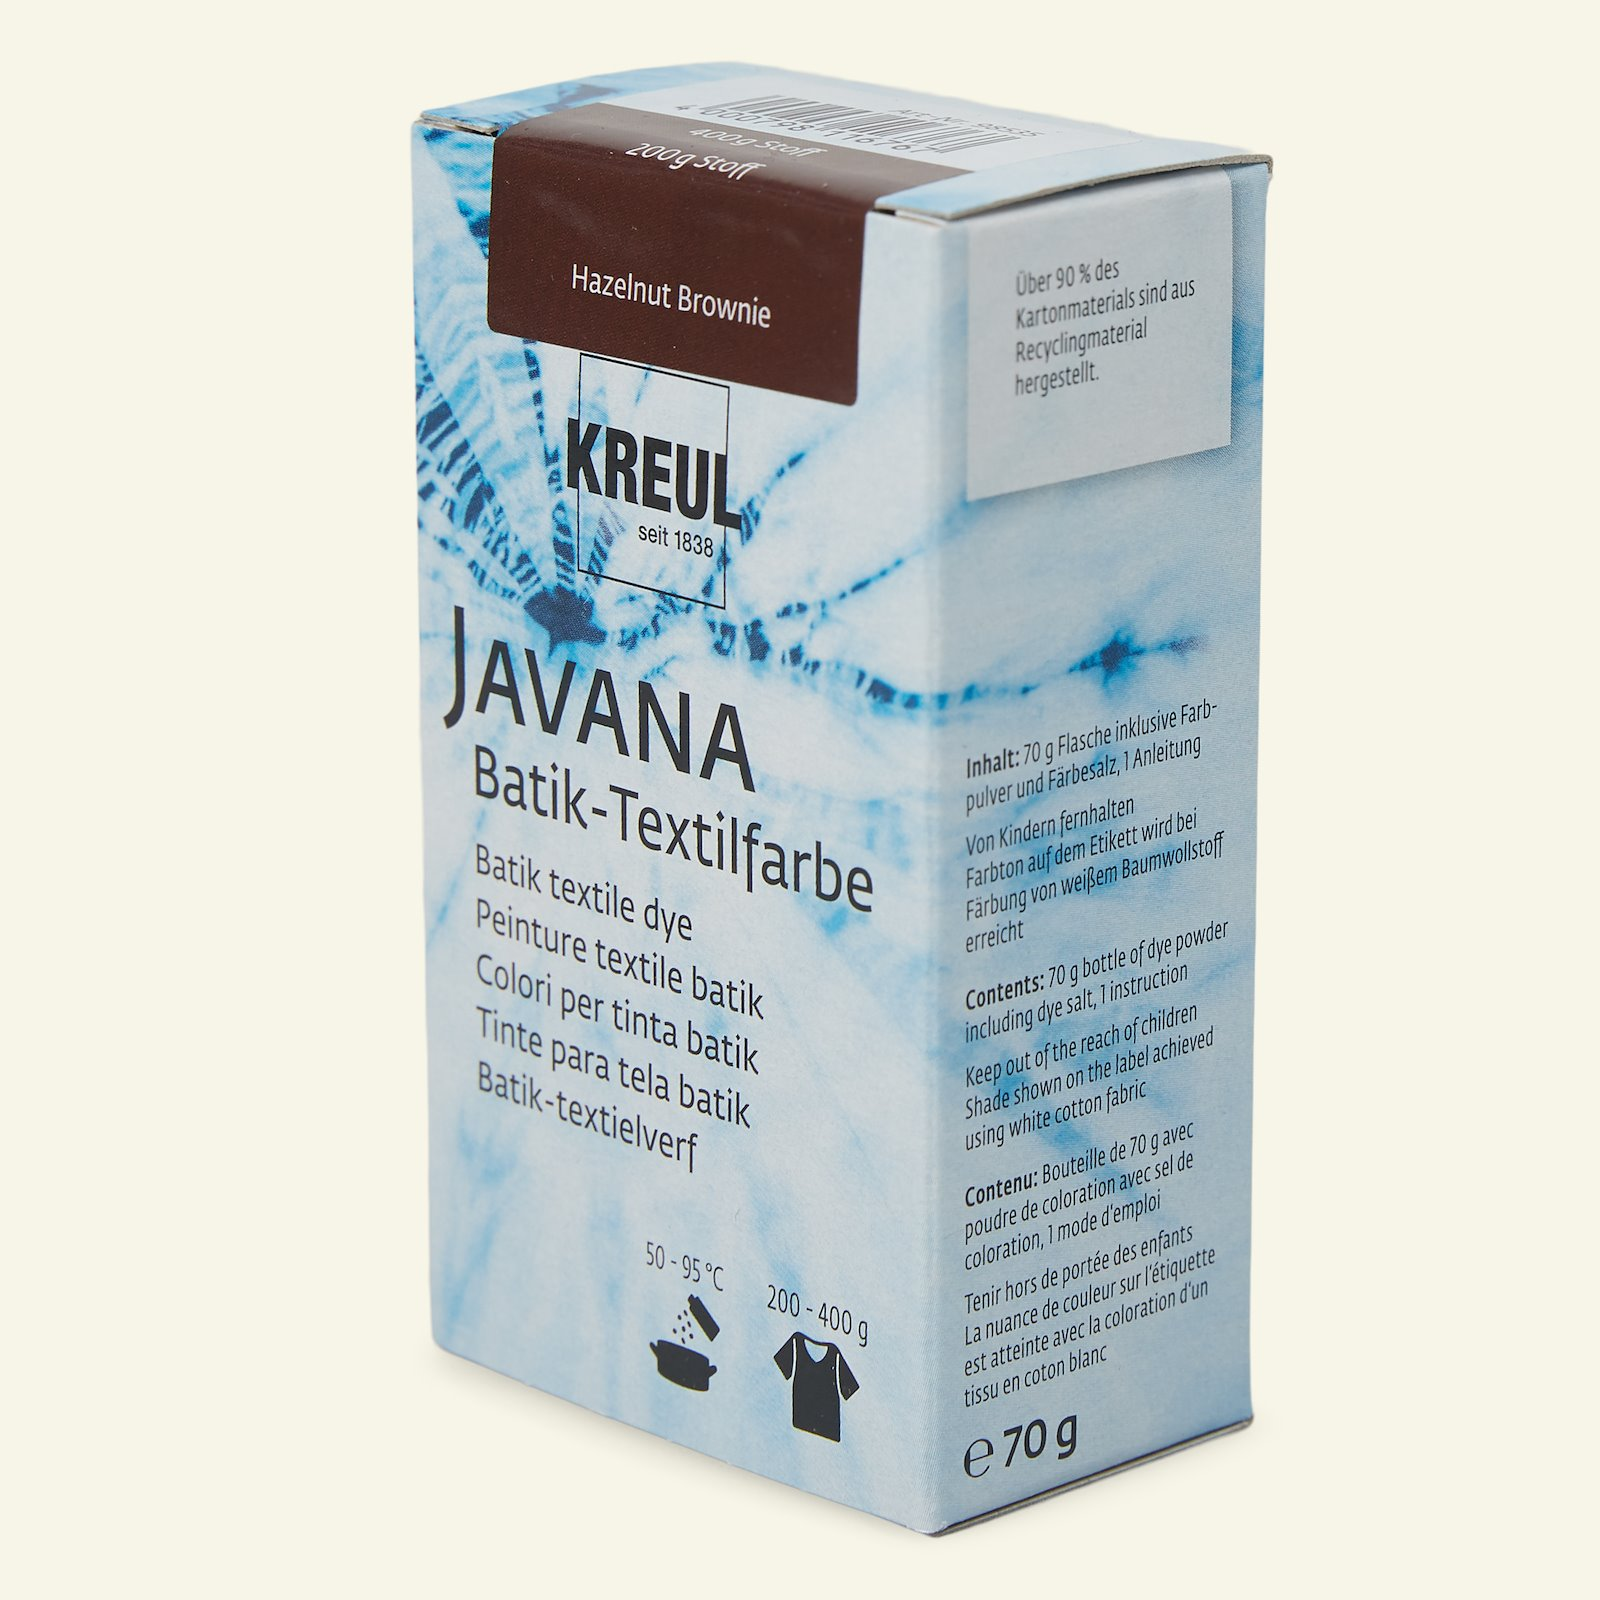 Javana Batikfarbe, Braun, 70g 29673_pack_b